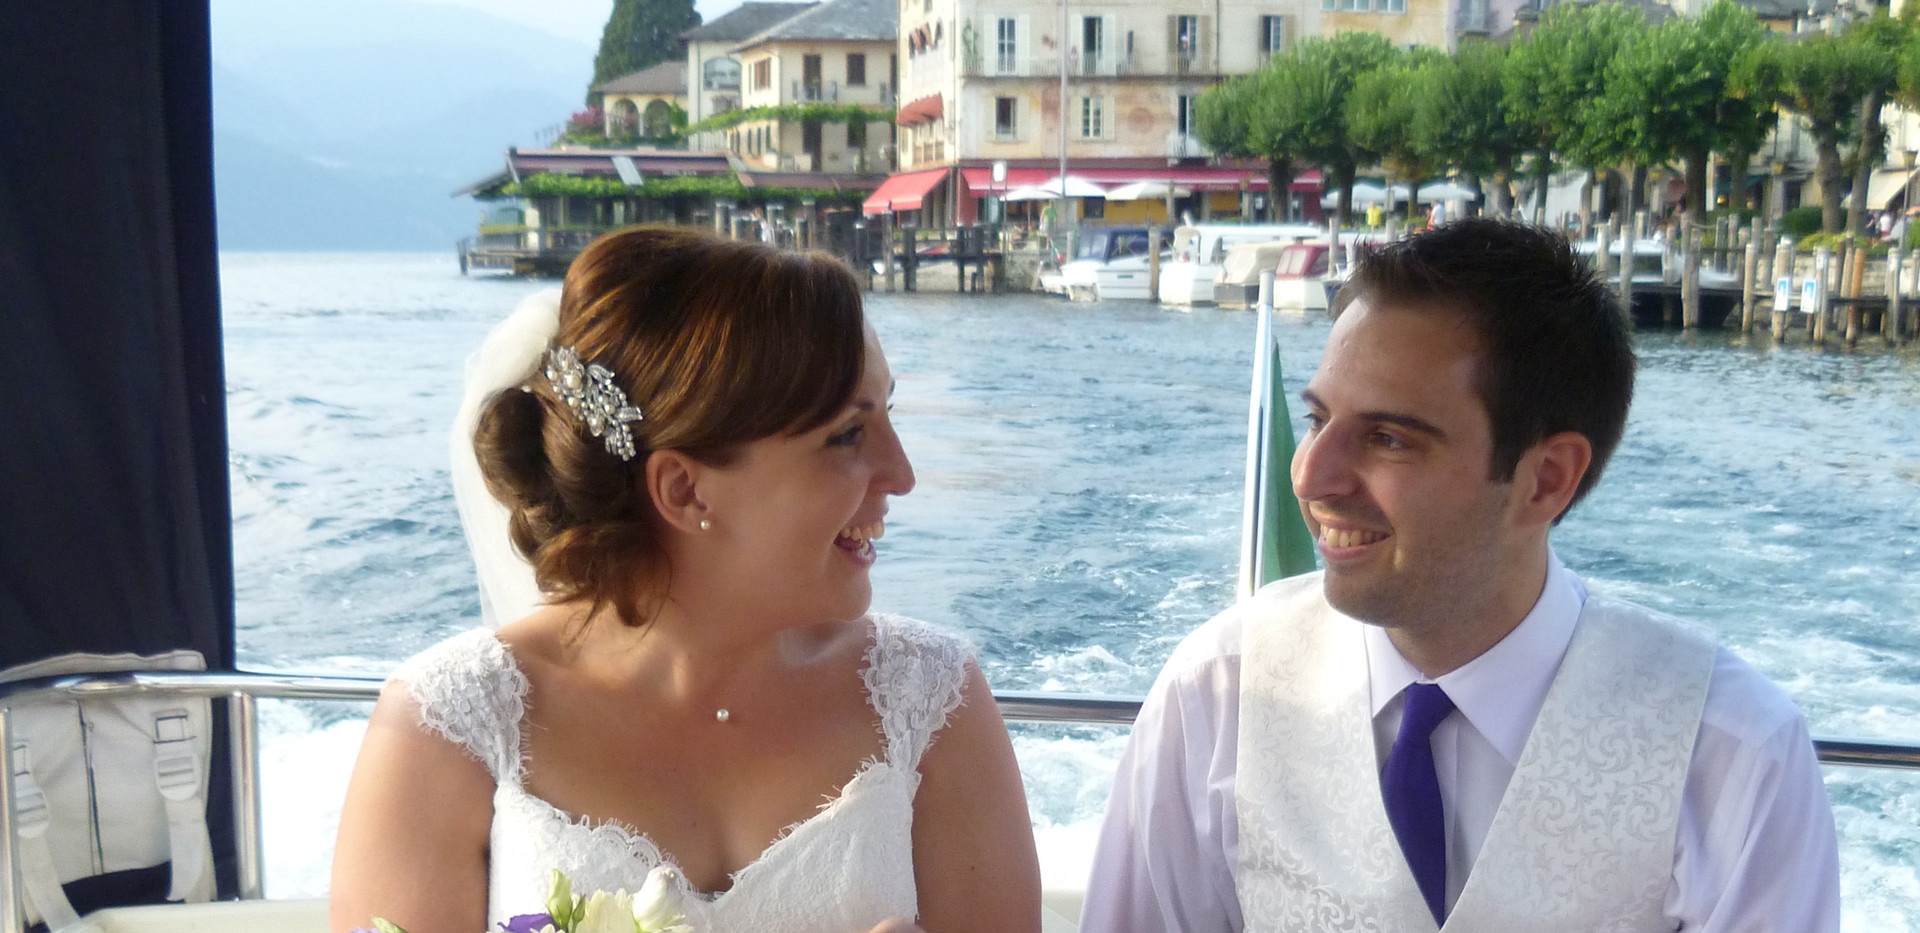 11. Speedy boat transfer for your weddin